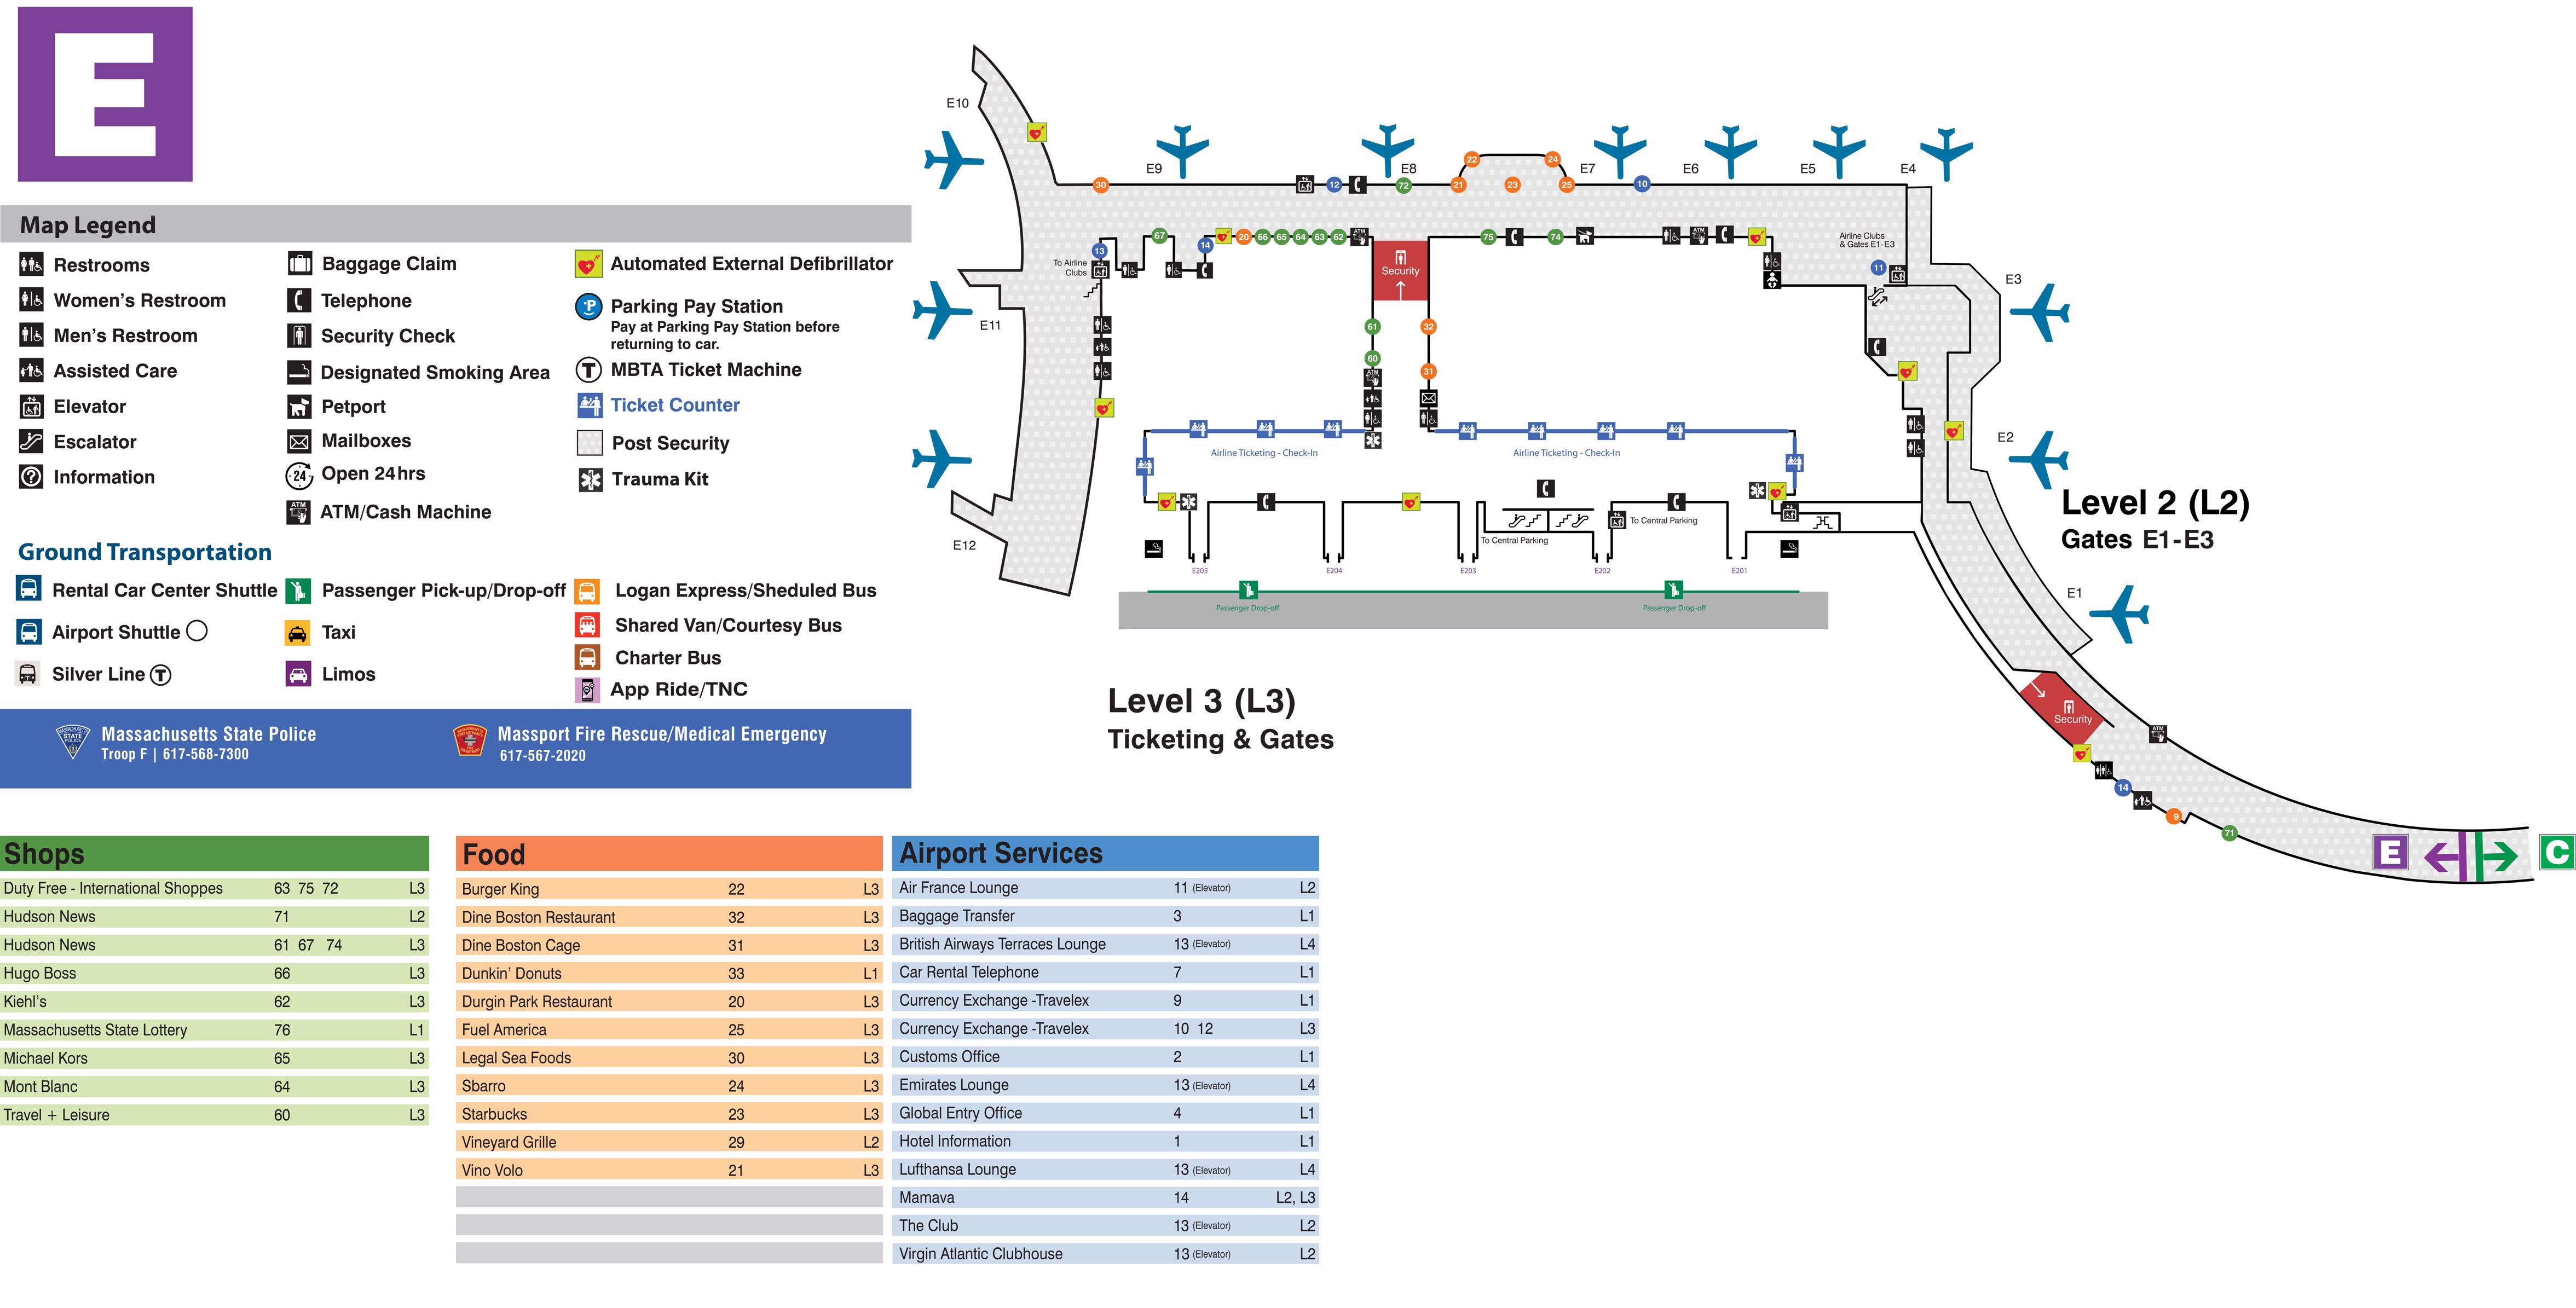 boston logan airport map (bos) - printable terminal maps